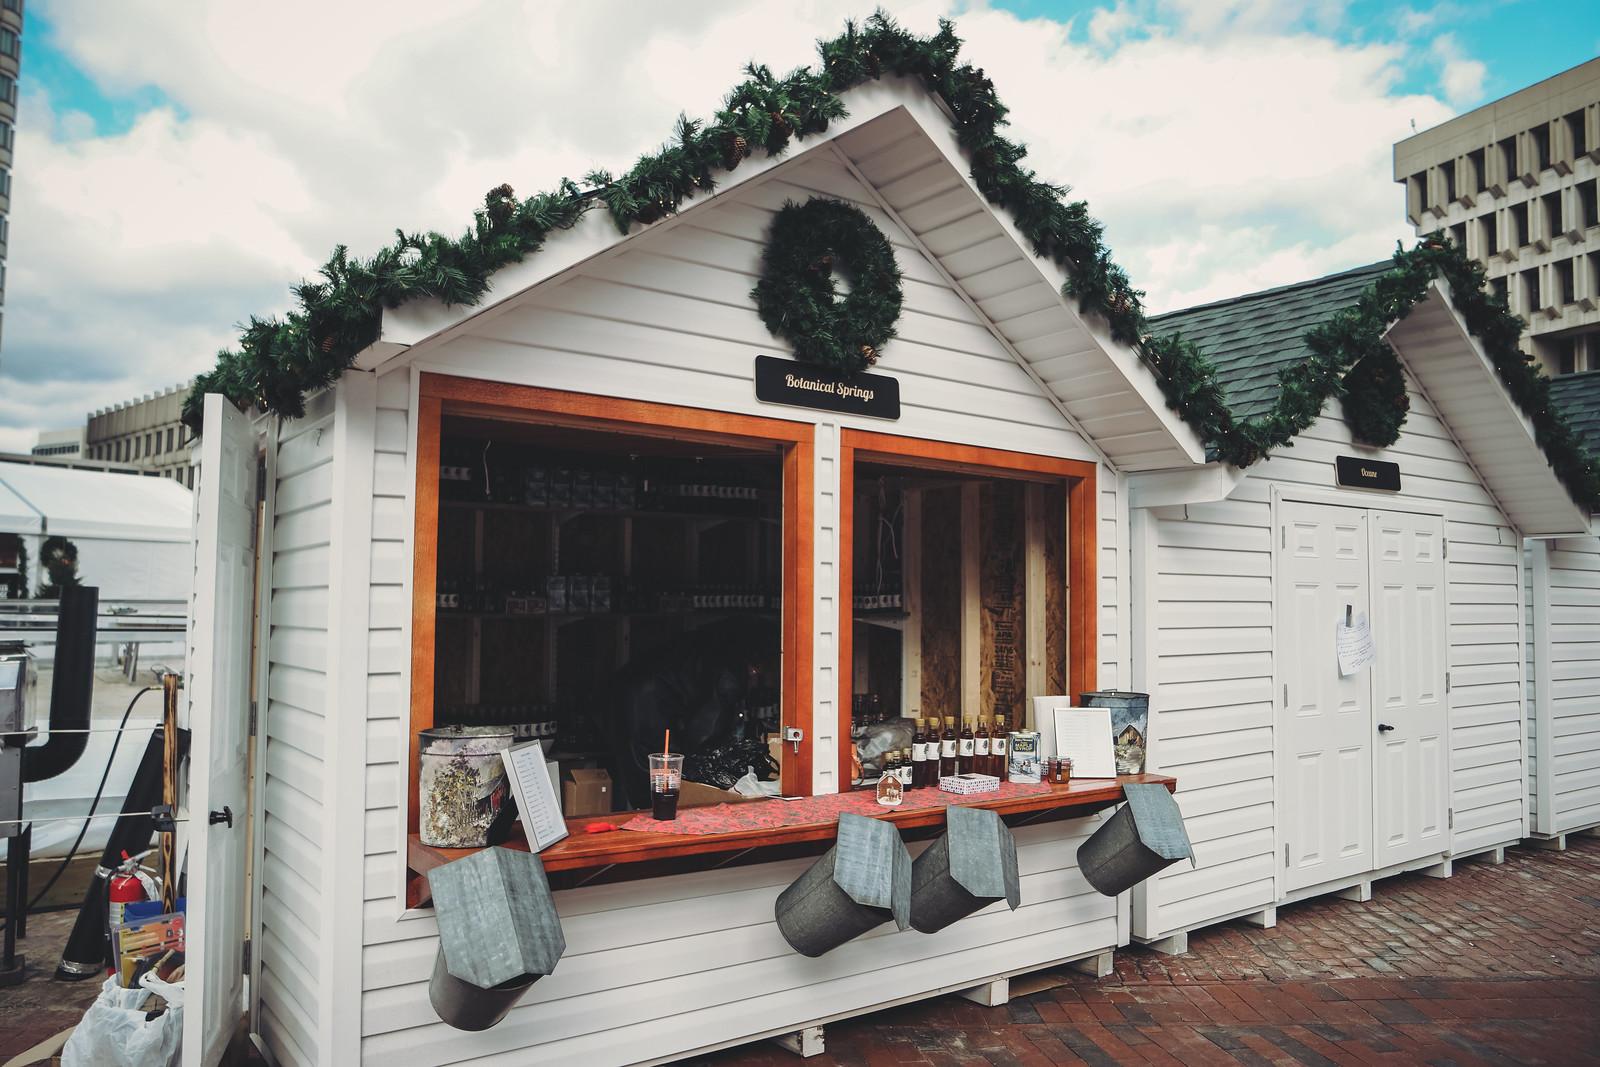 Boston Winter Holiday Marketplace